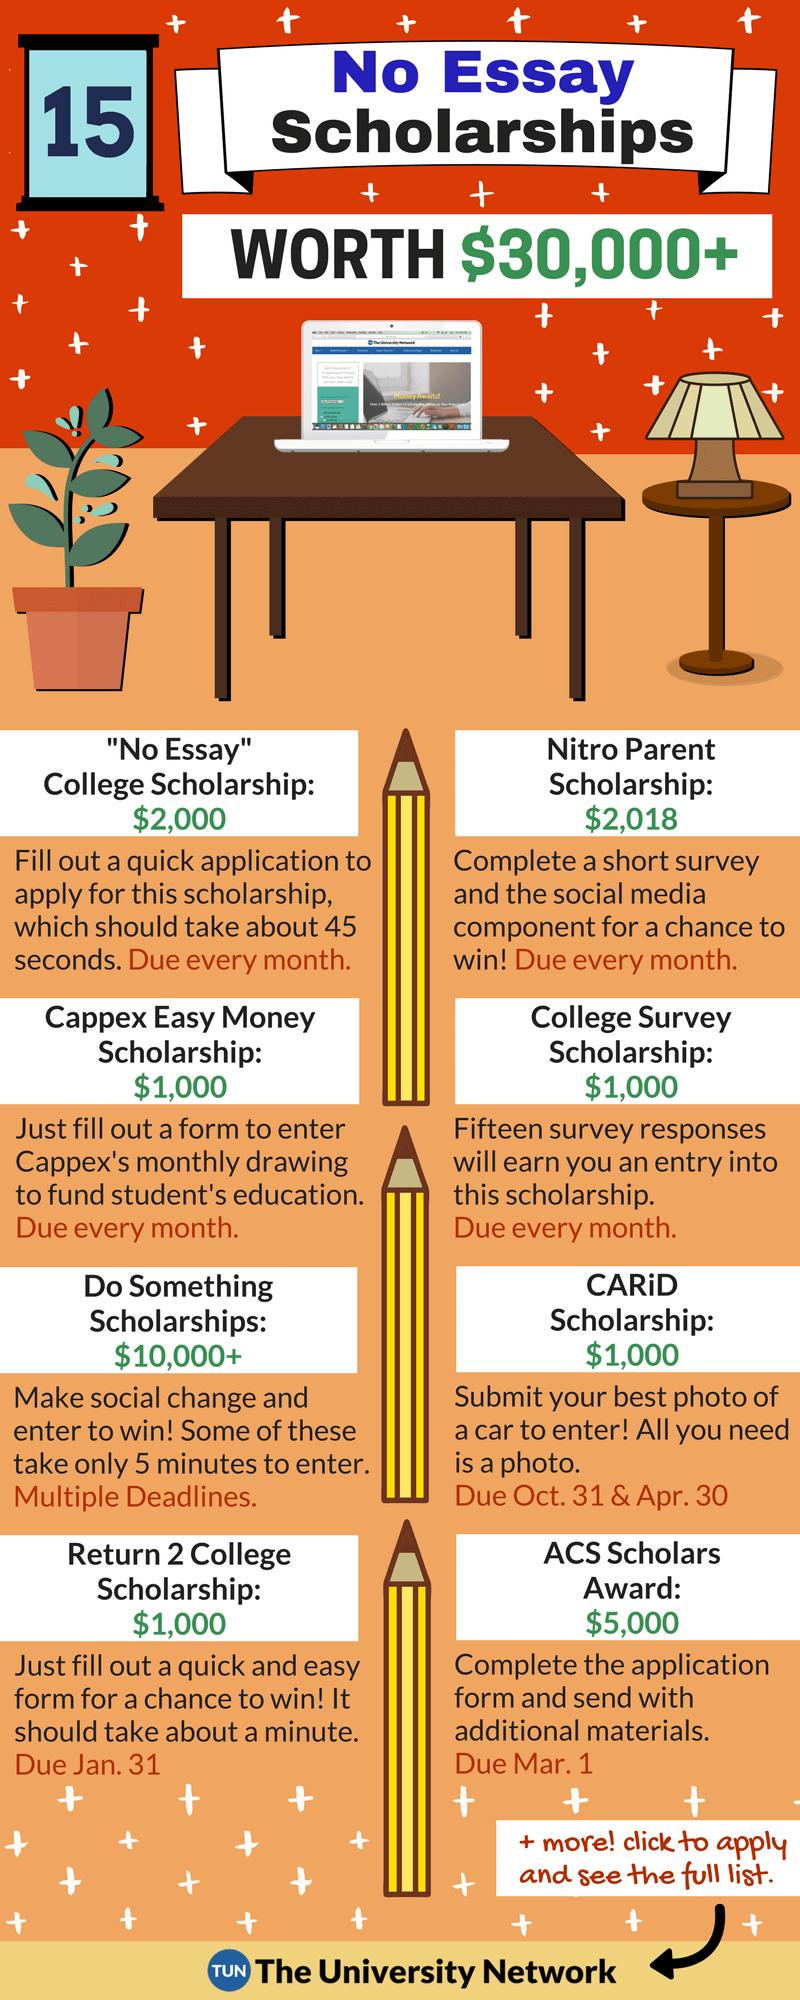 006 Easy No Essay Scholarships Striking 2015 2019 Full